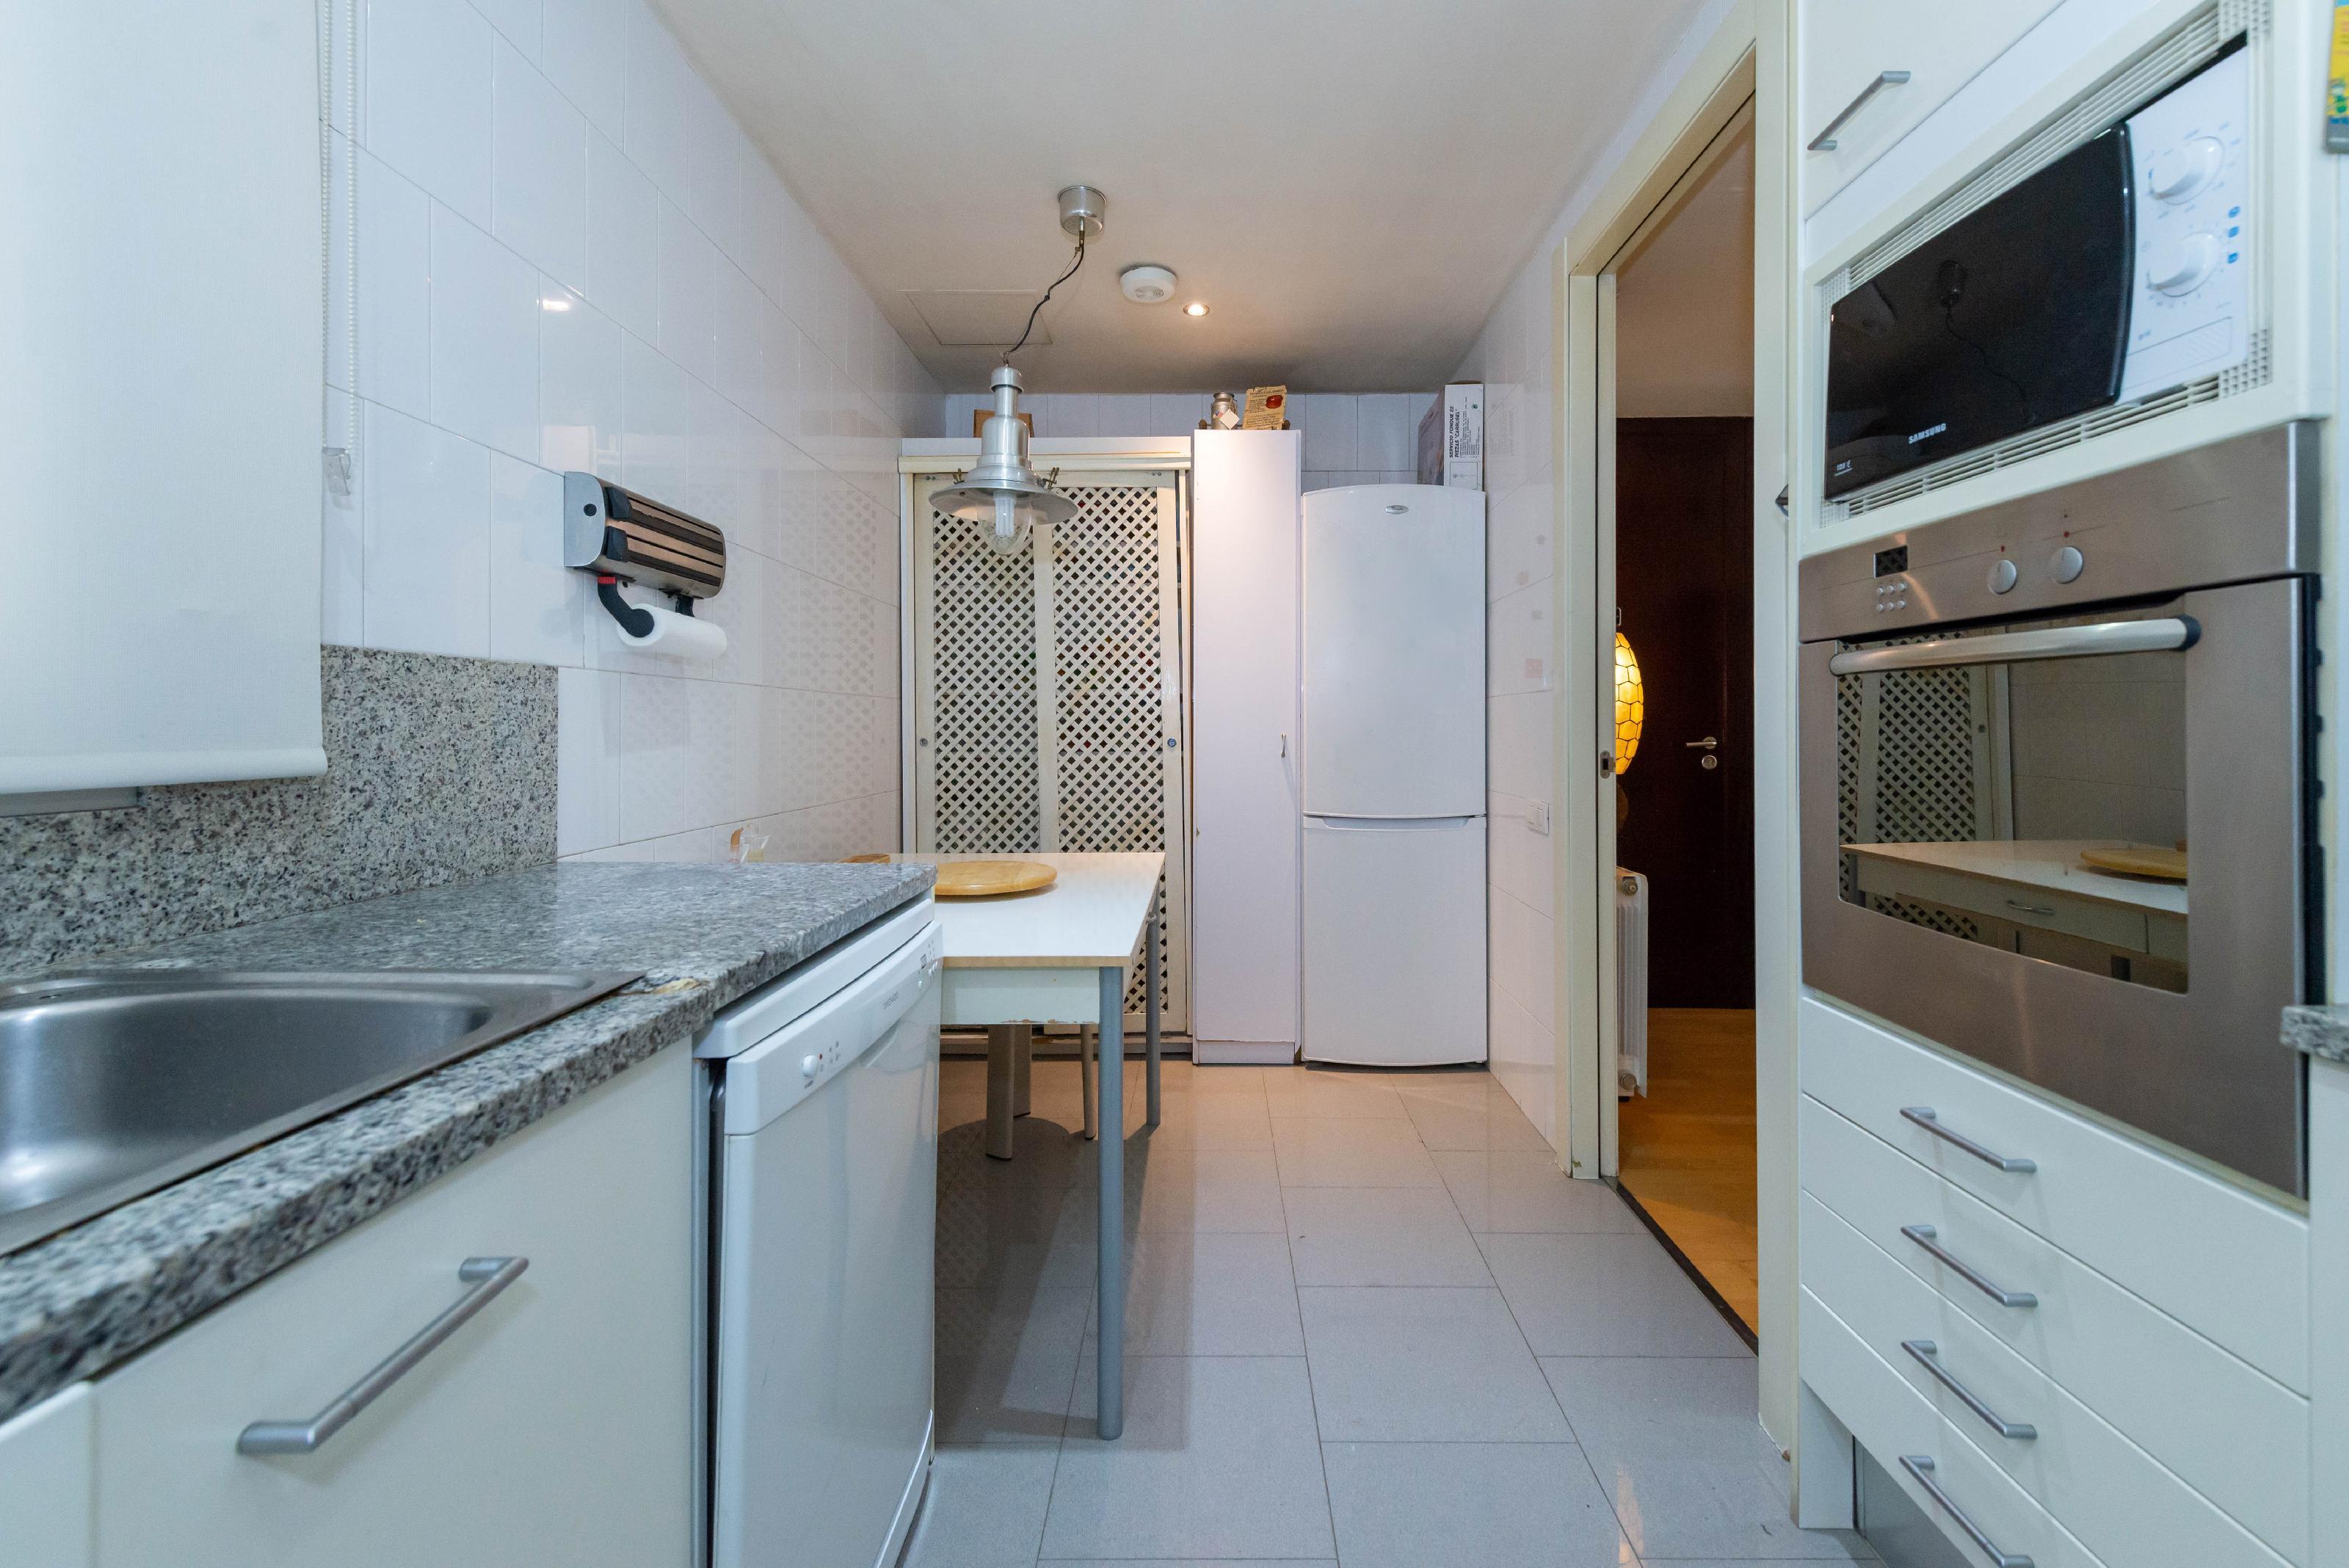 251446 Flat for sale in Sarrià-Sant Gervasi, Tres Torres 18